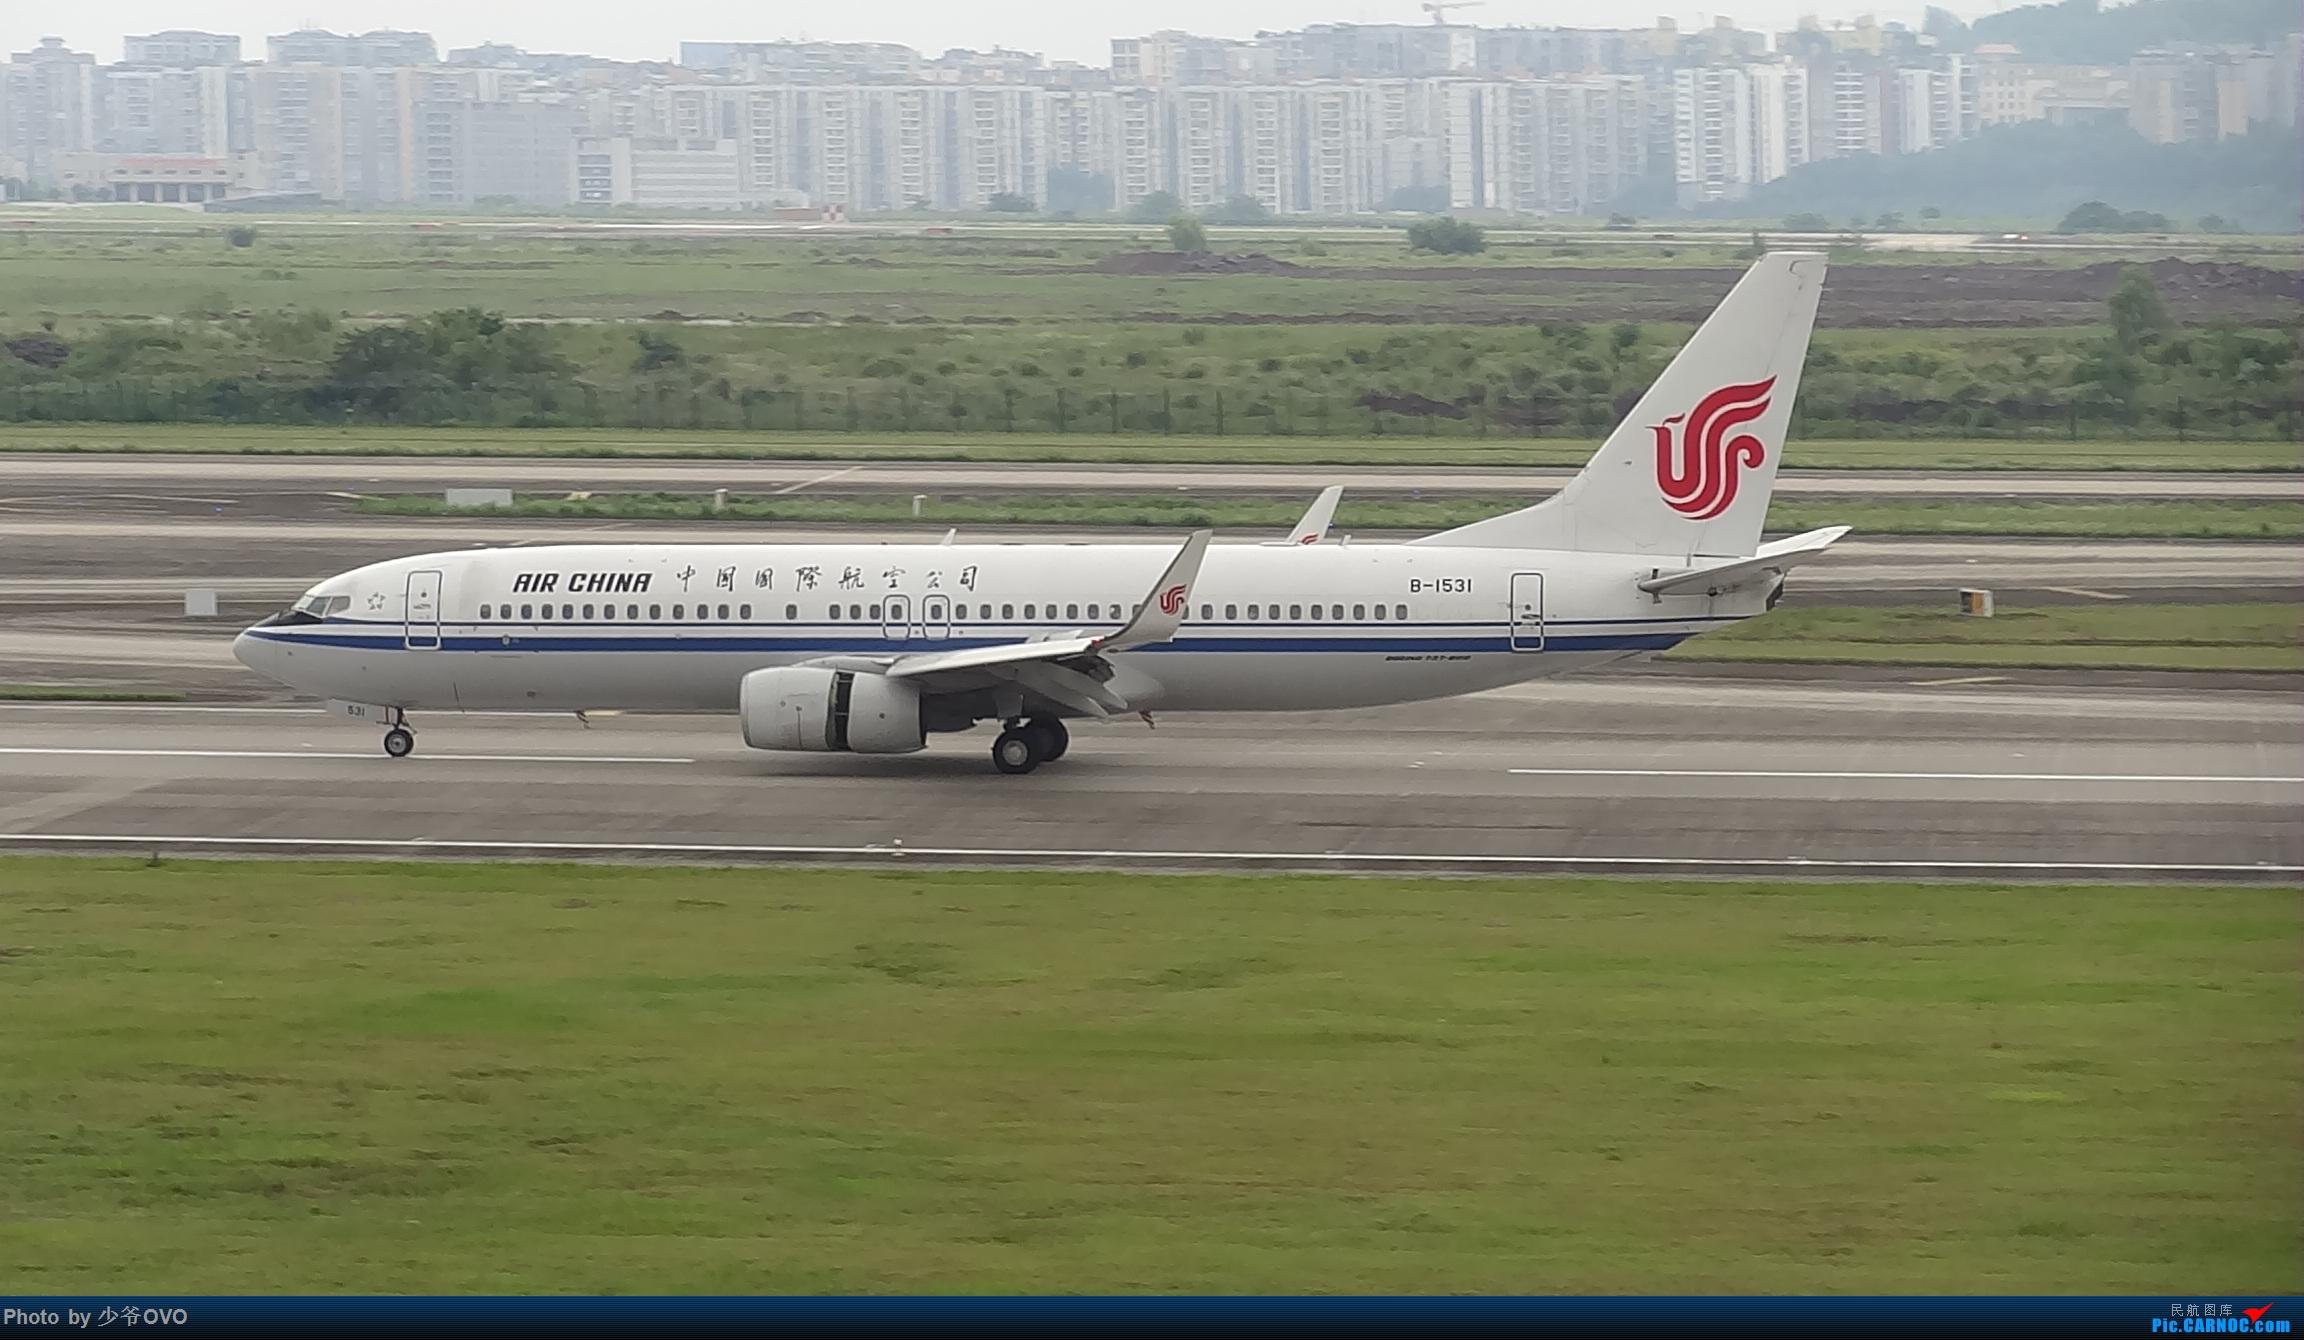 Re:[原创]CKG重庆江北机场拍机 ,中法建交50周年 BOEING 737-800 B-1531 中国重庆江北国际机场